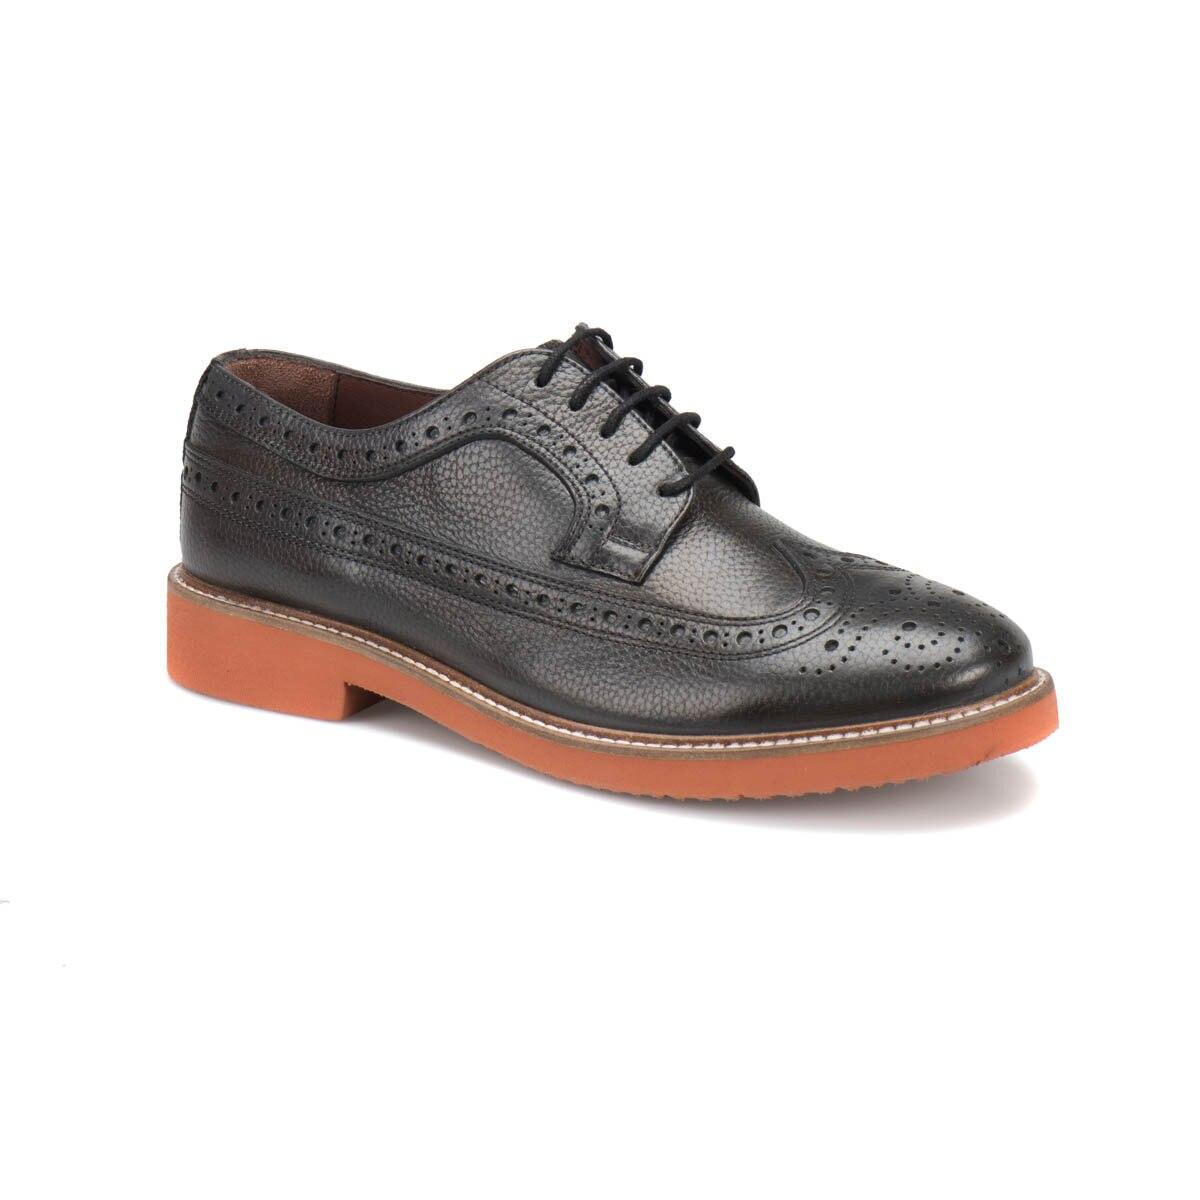 FLO 70105-1 M 1506 Navy Blue Men 'S Modern Shoes Cordovan